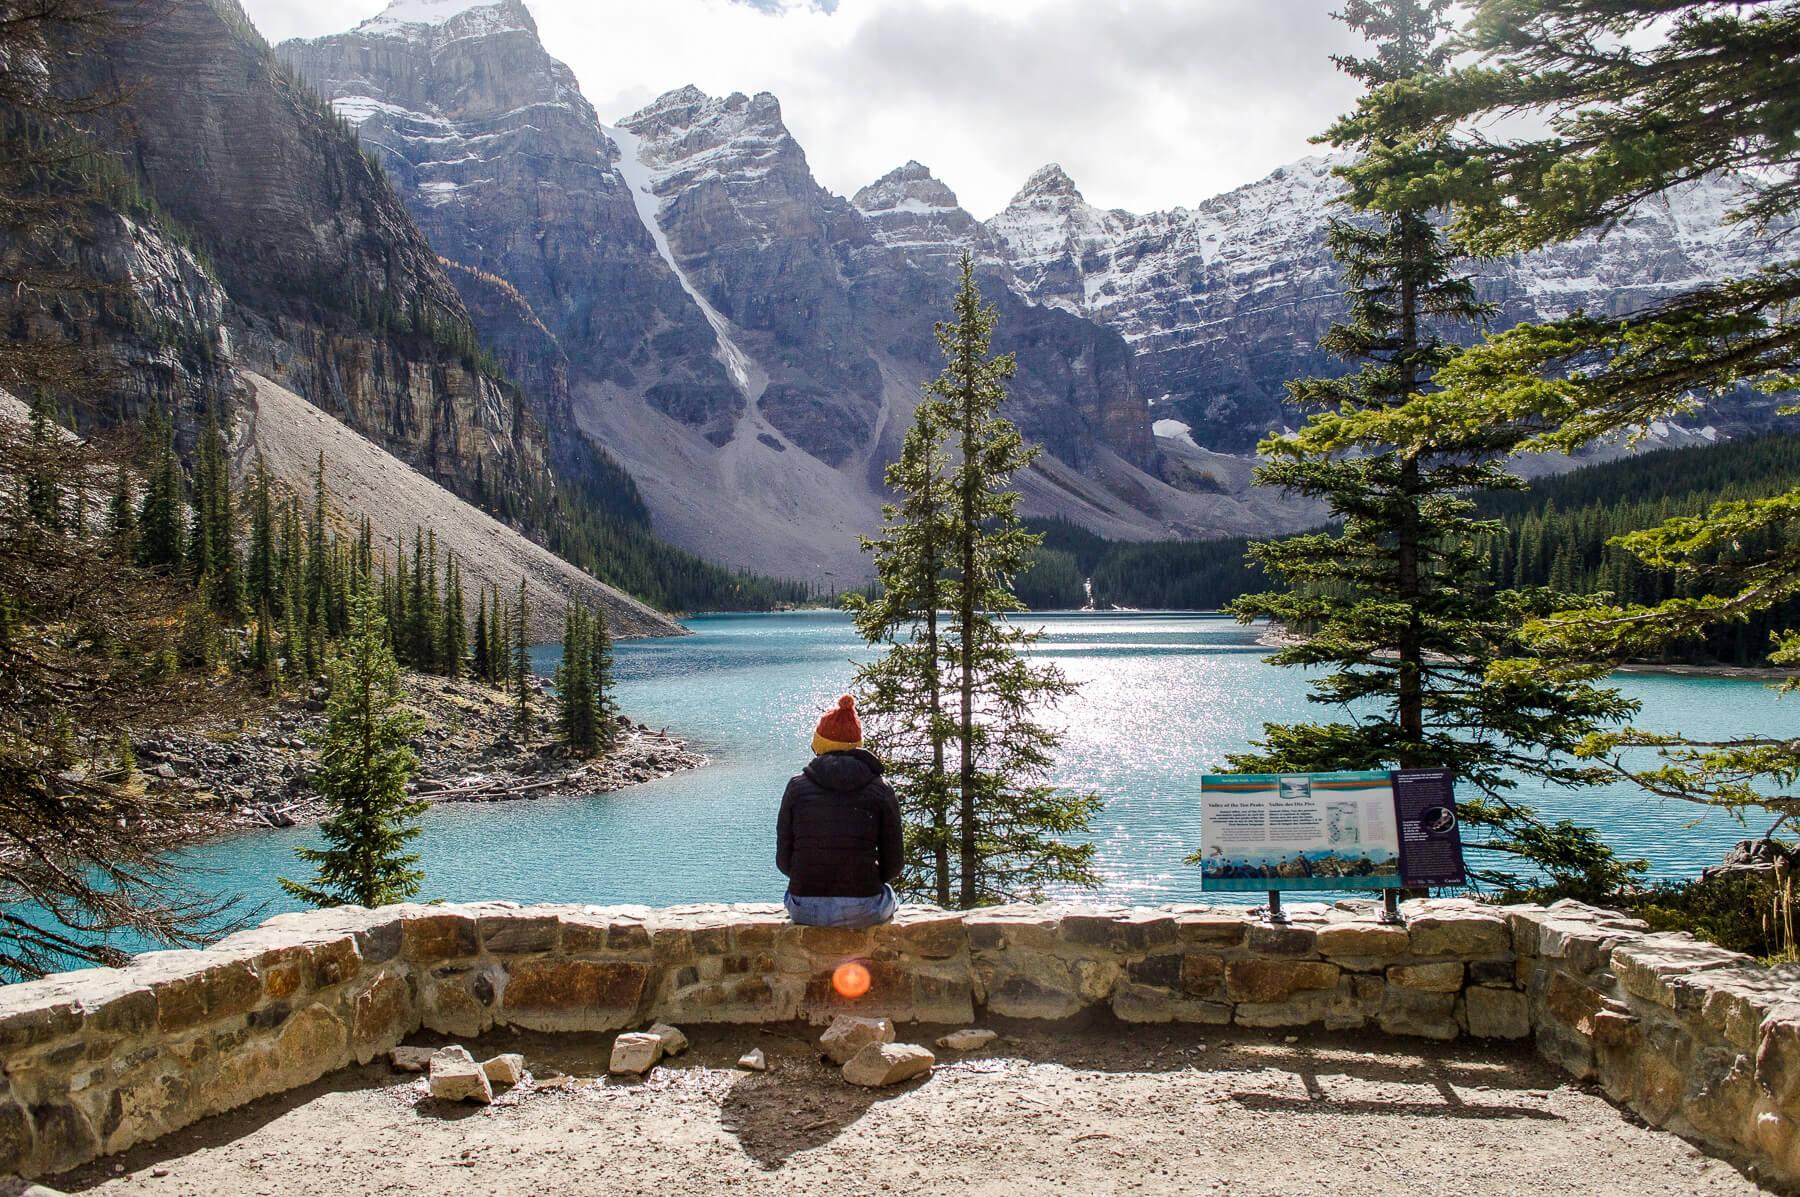 Girl sitting on ledge overlooking turquoise lake and mountains